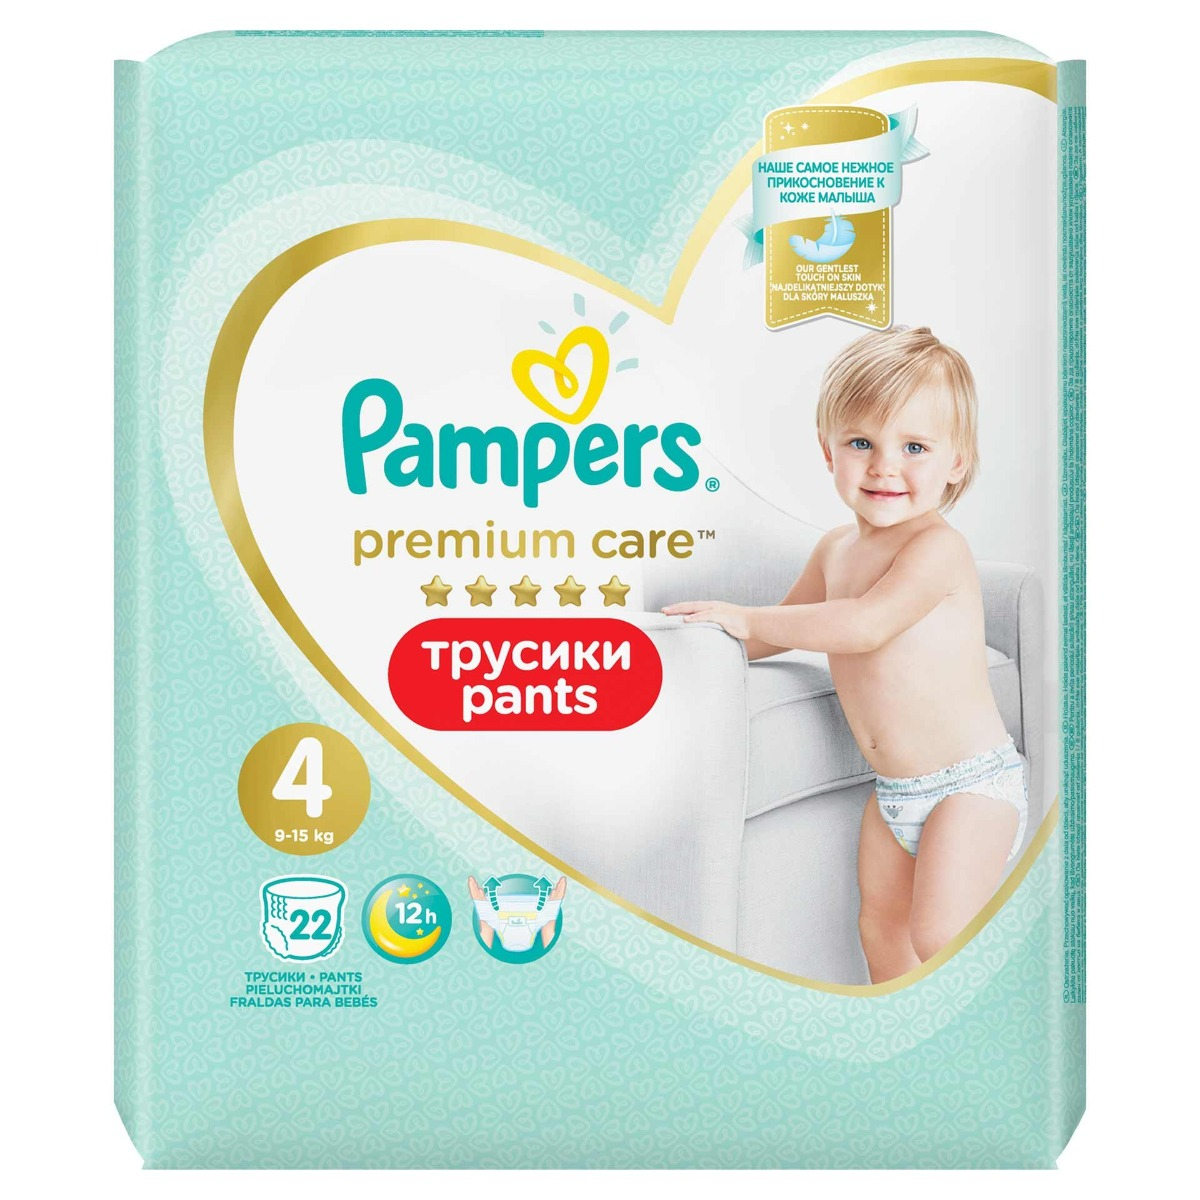 Scutece-chilotel Premium Care Pants Carry Pack marimea 4 Maxi pentru 8-14kg, 22 bucati, Pampers drmax.ro